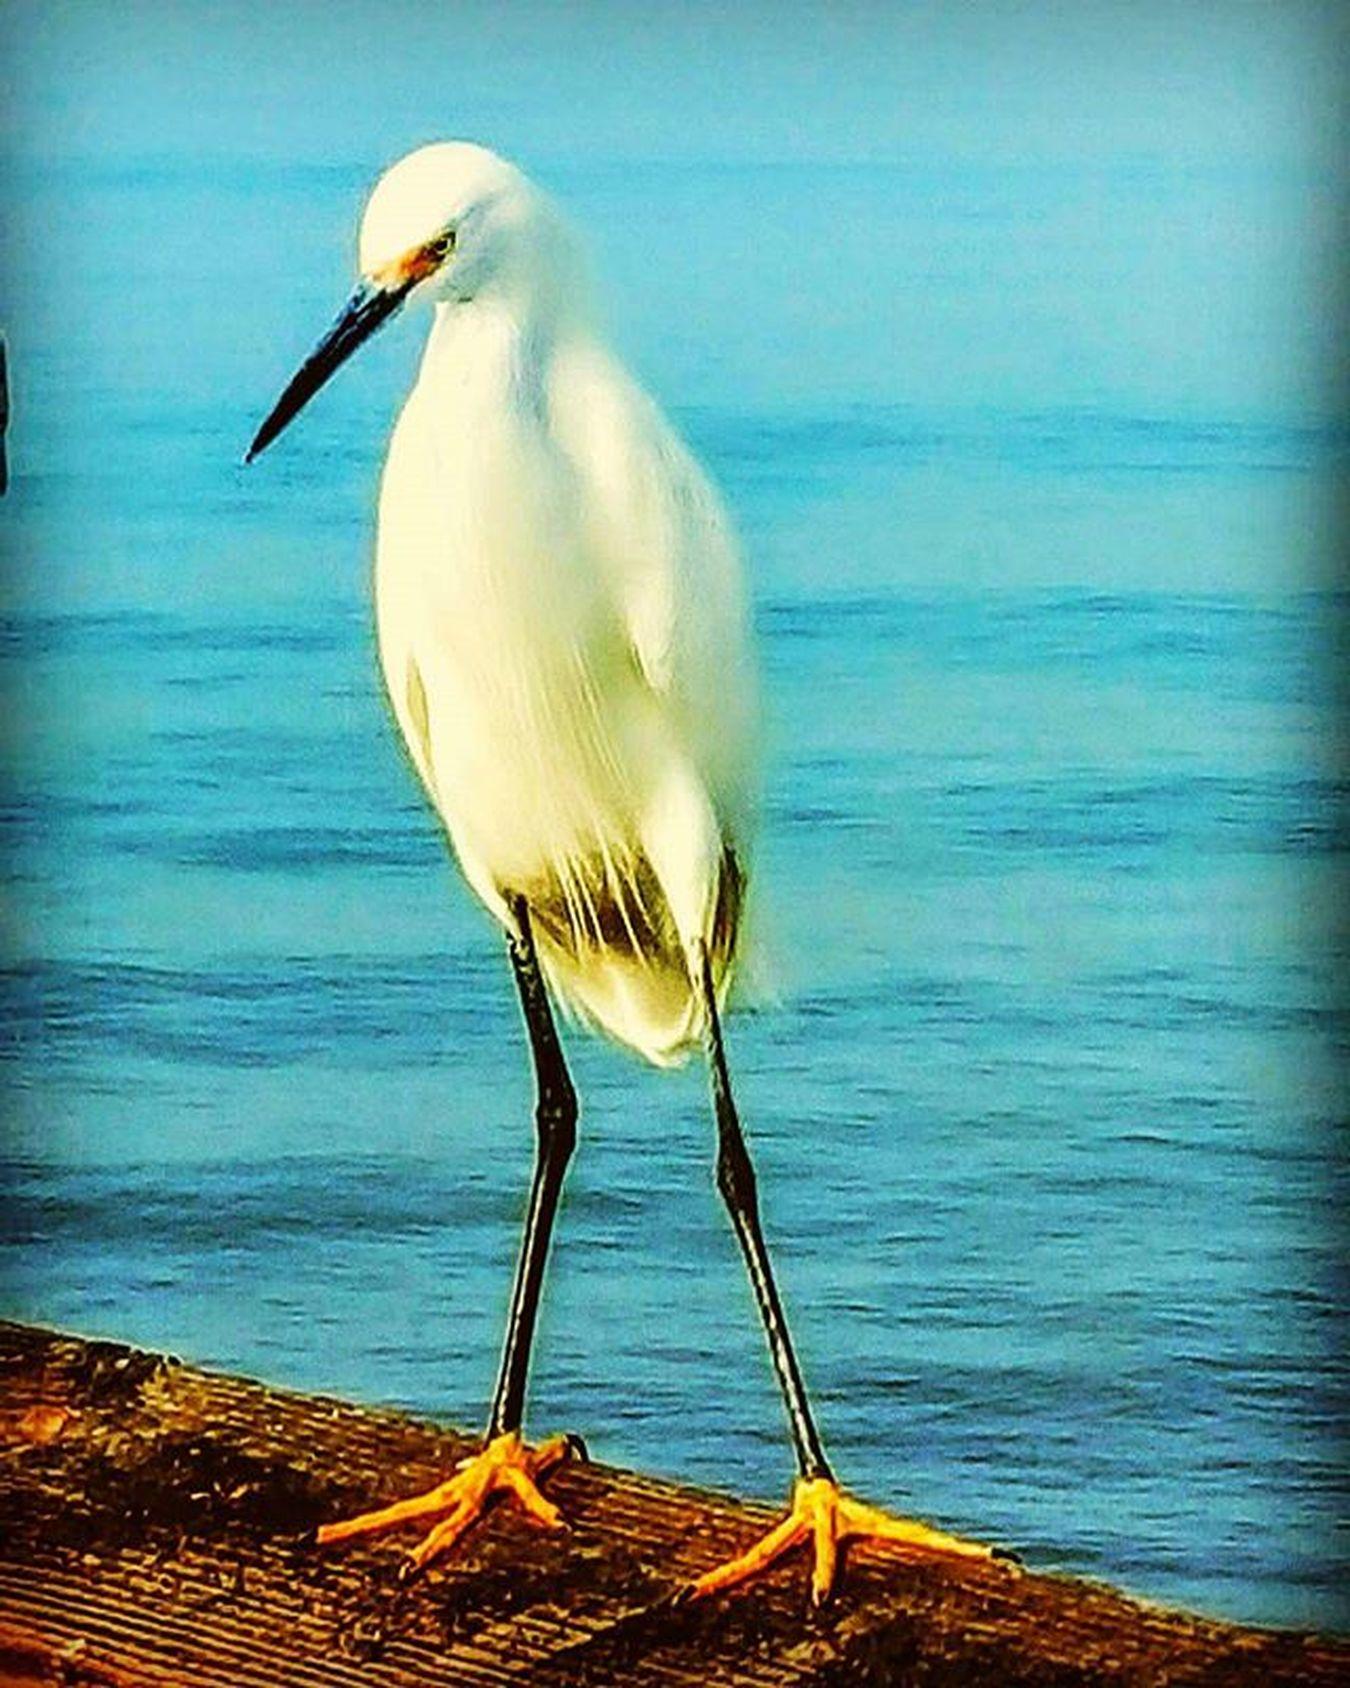 Venicebeach , Venicepier , Birdy , Beachbird , Strangebird